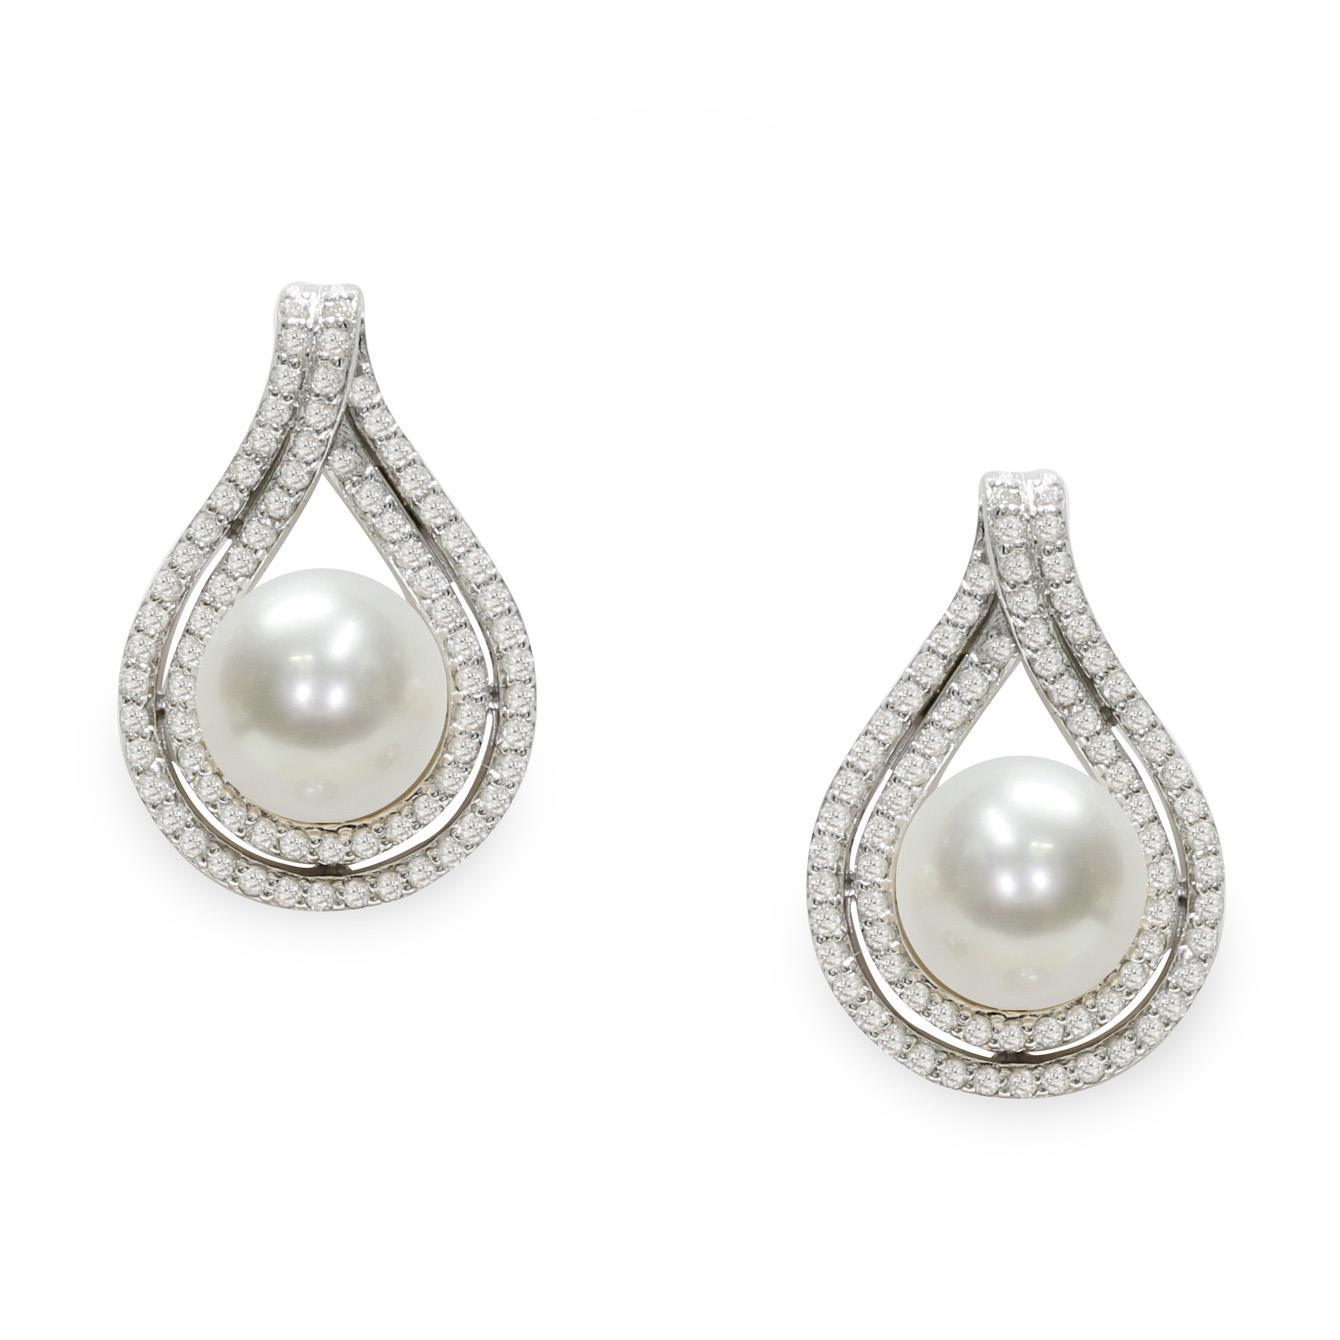 Earrings with pearls - MAYUMI